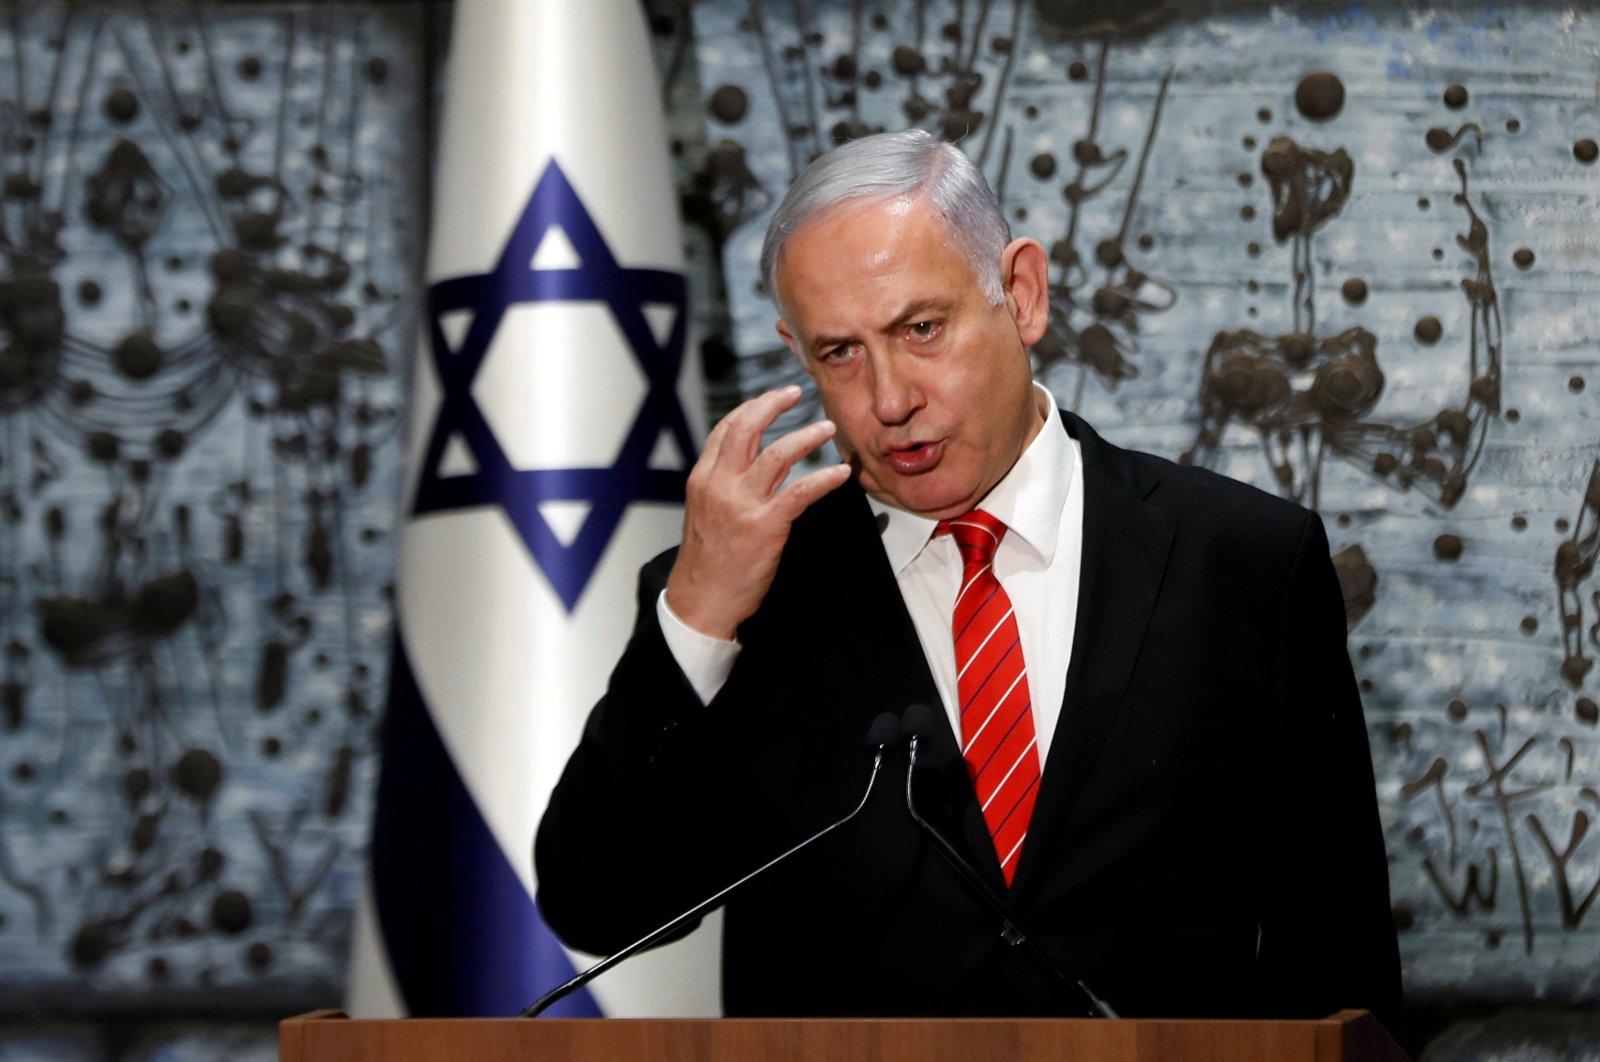 Israeli Prime Minister Benjamin Netanyahu speaks during a nomination ceremony, Jerusalem, Sept. 25, 2019. (REUTERS Photo)